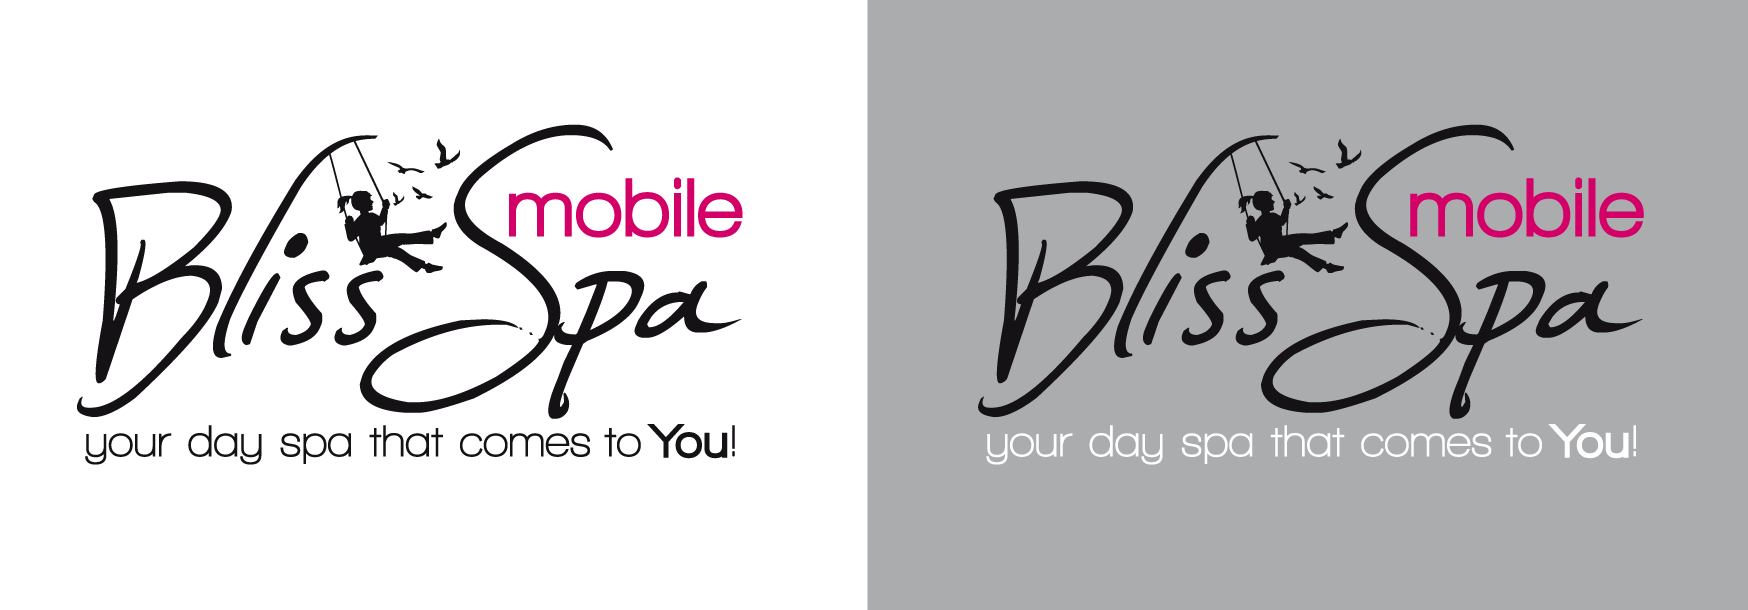 Logo Design by luna - Entry No. 53 in the Logo Design Contest New Logo Design for Bliss Spa Mobile.